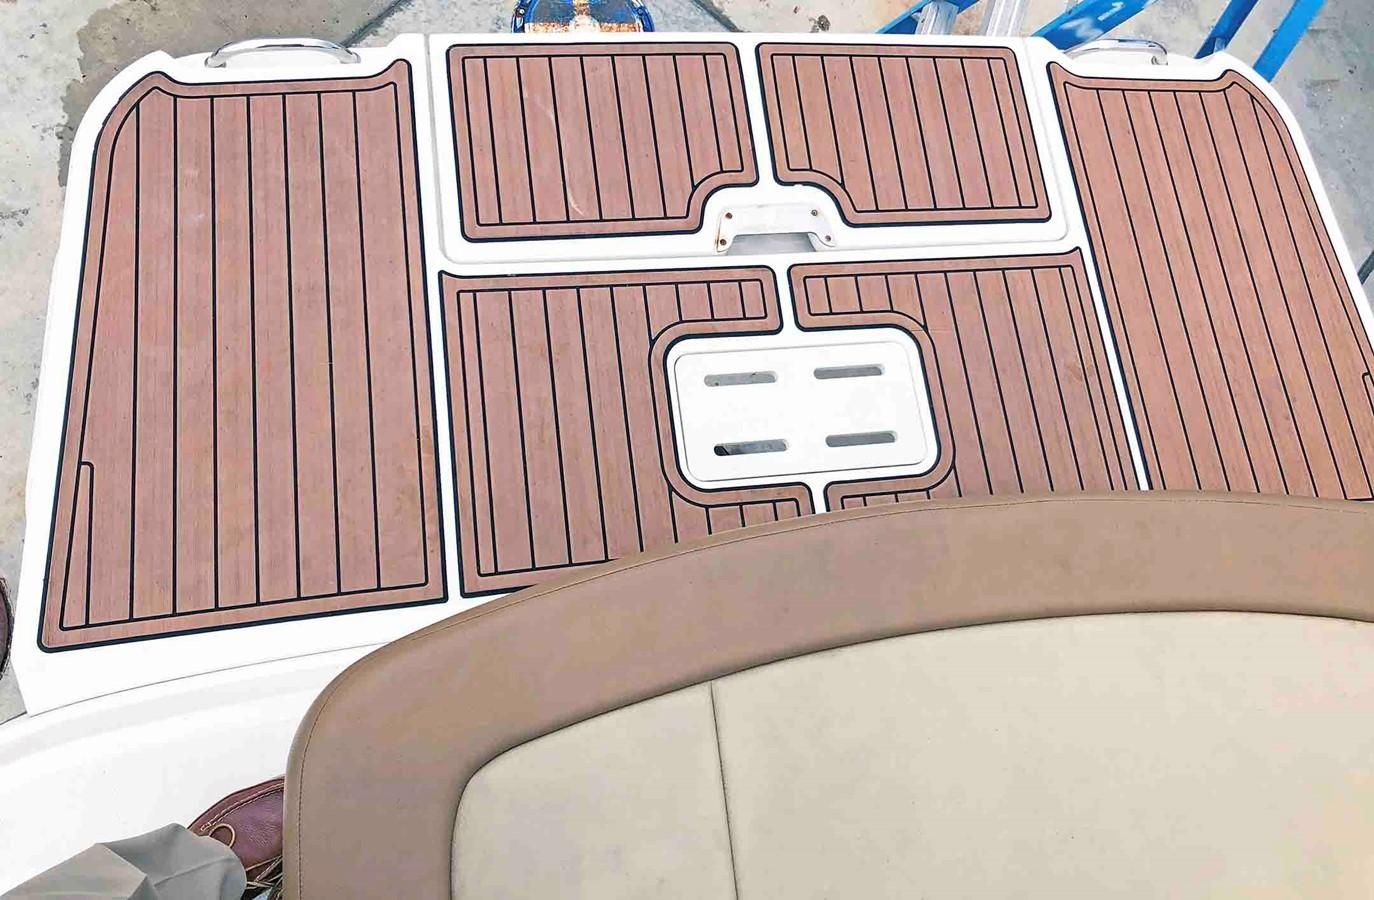 2015 SEA RAY 240 SunDeck Deck Boat 2674239